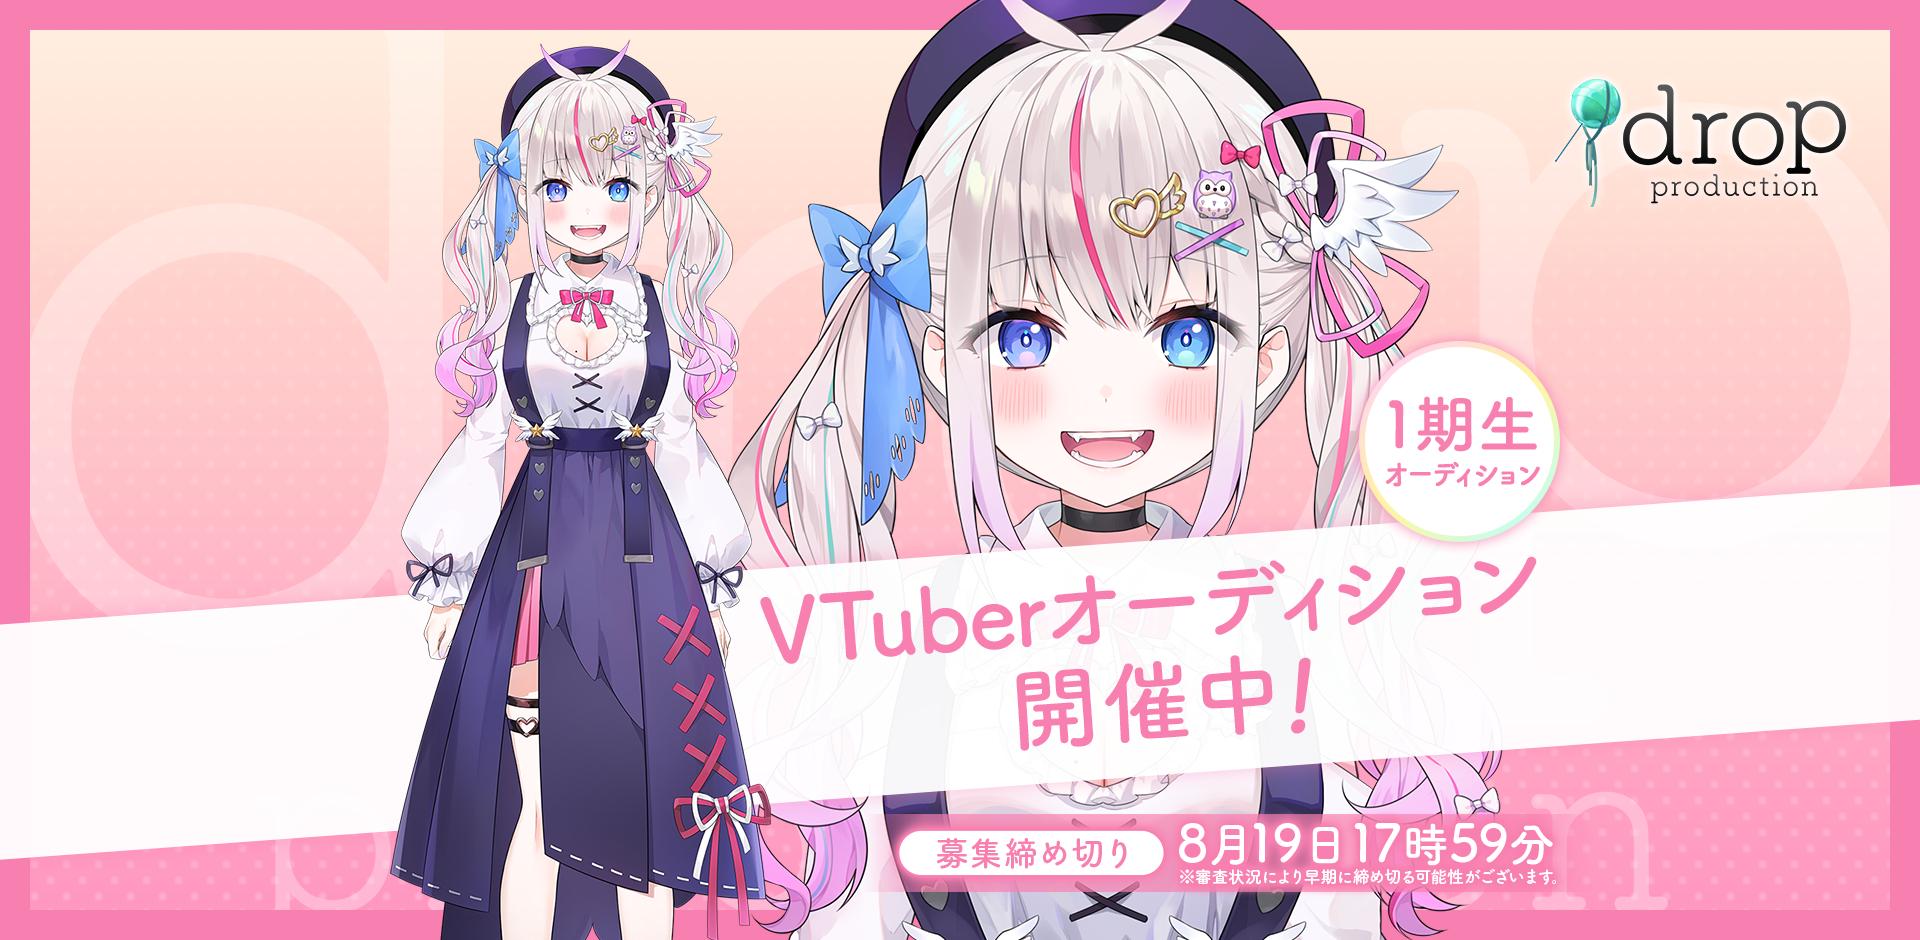 drop production VTuberオーディション開催中!